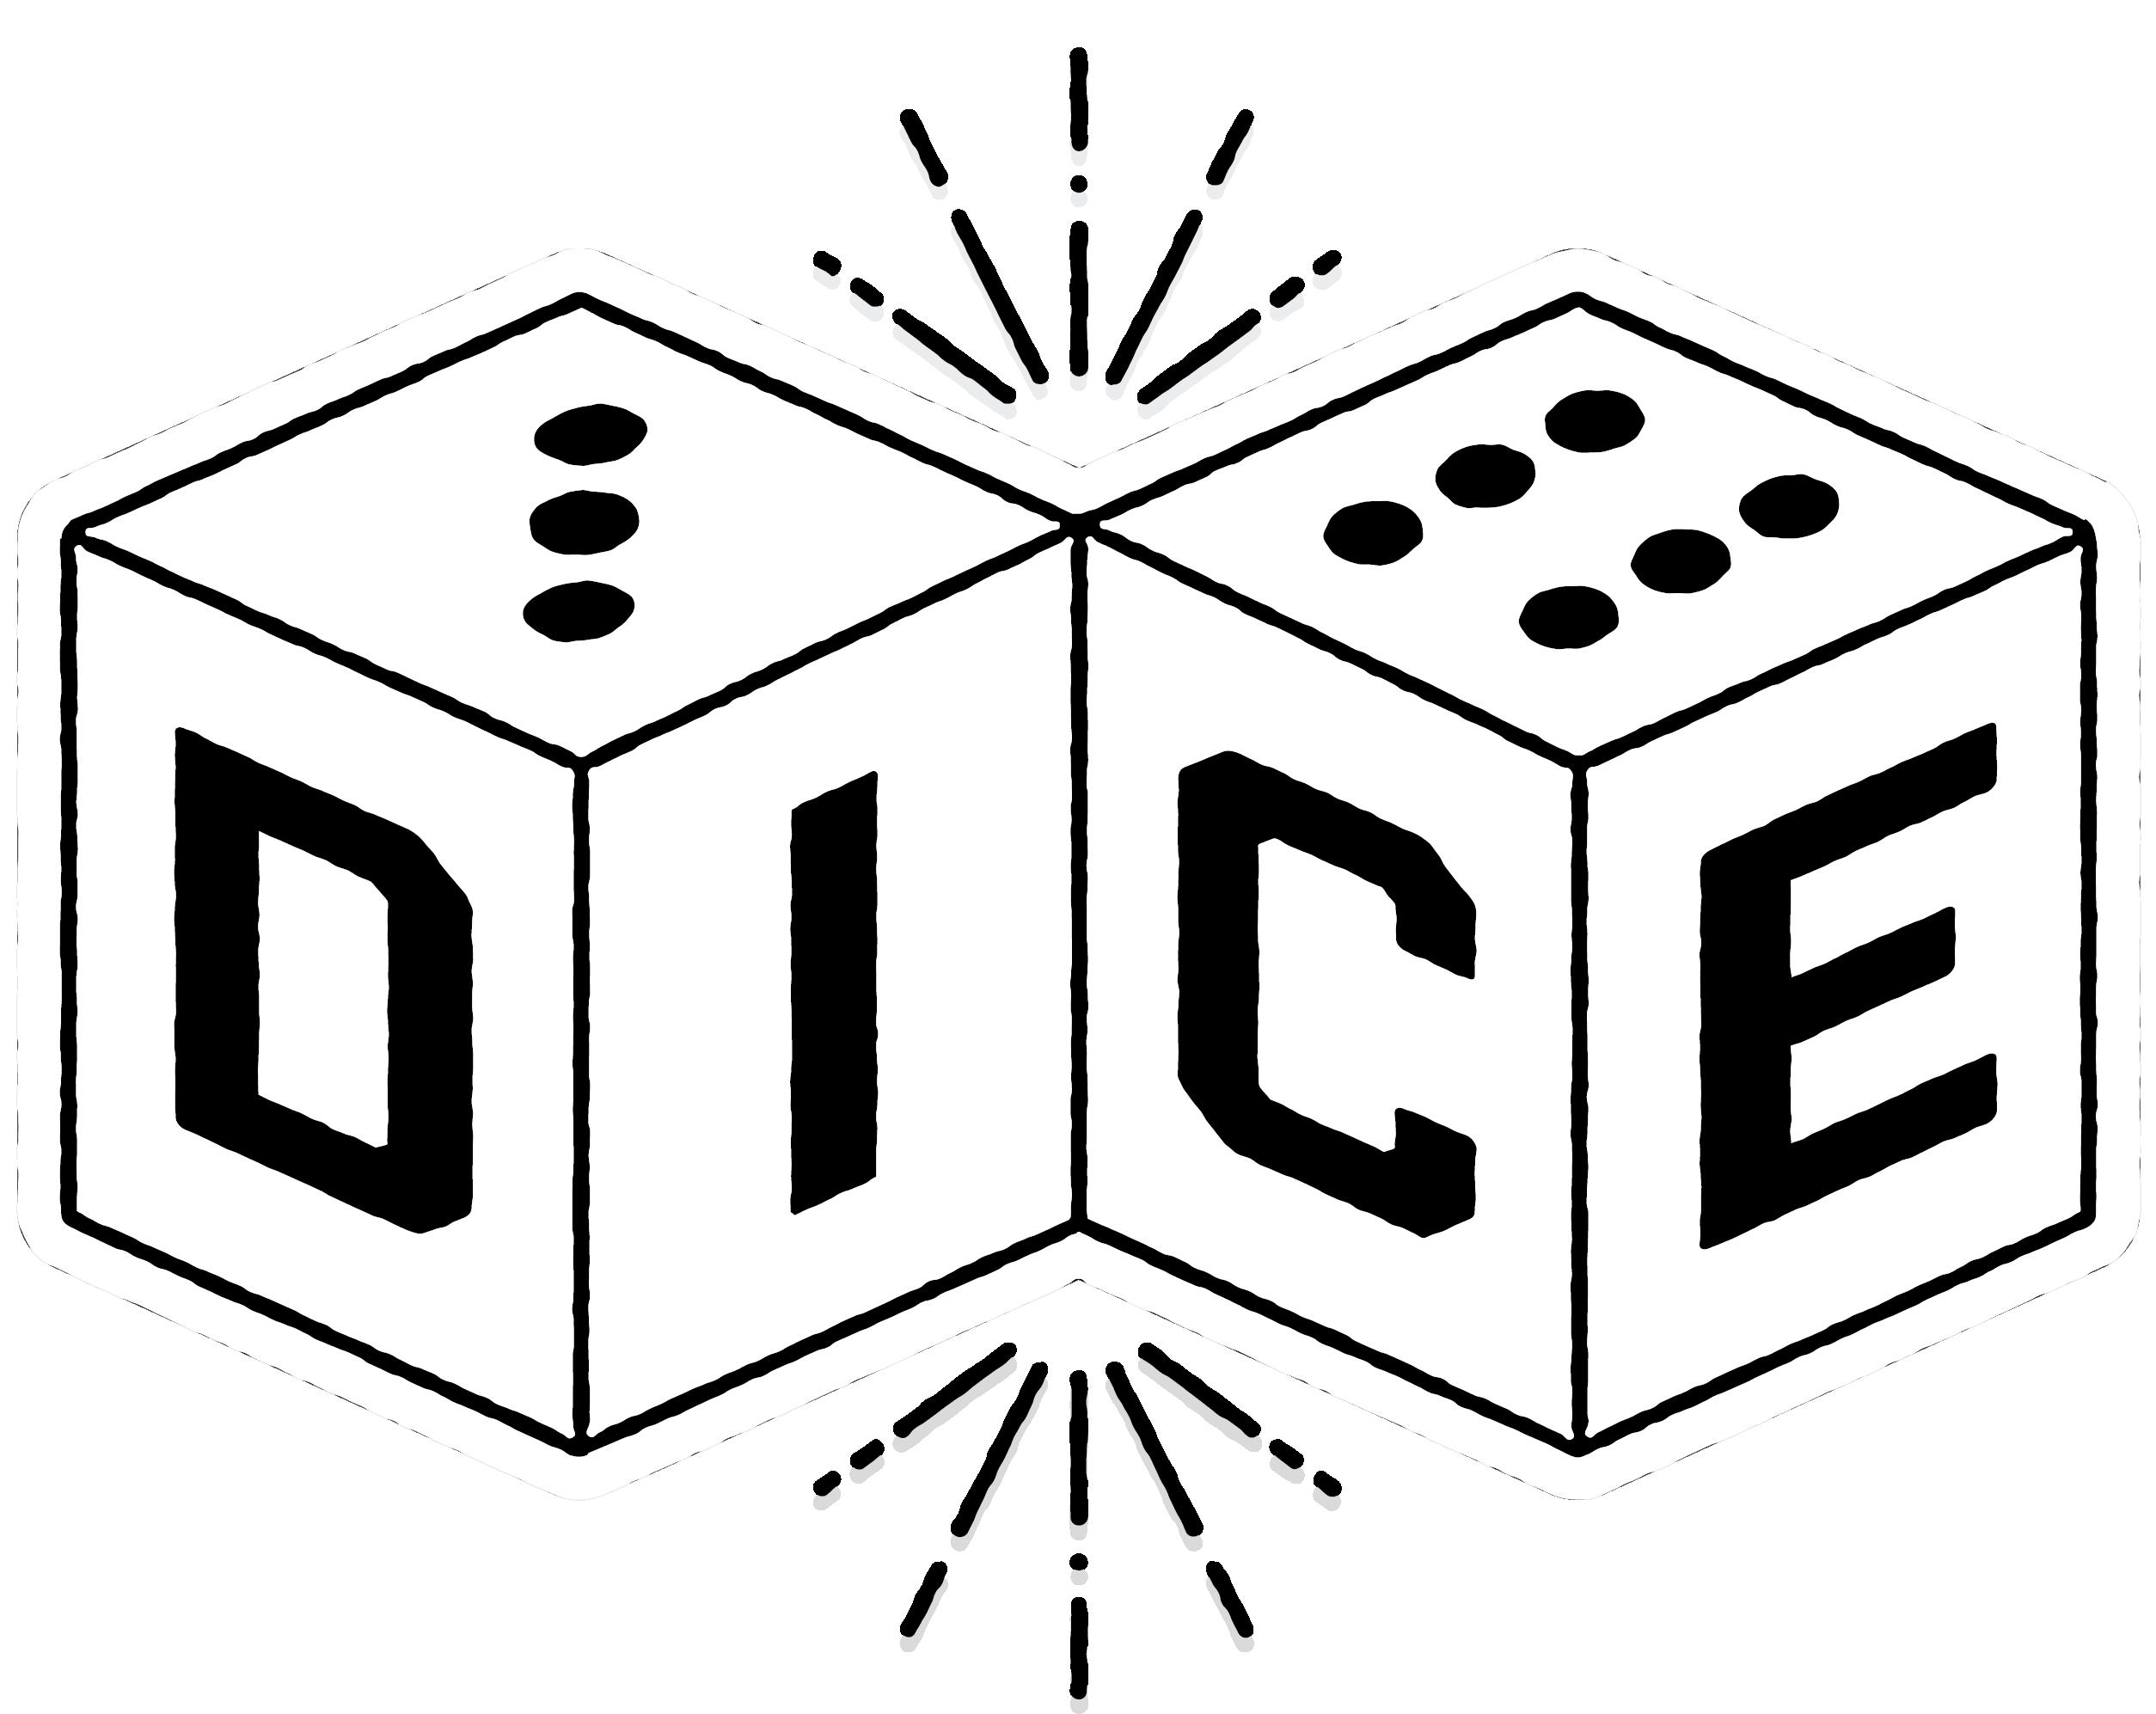 Dice in Portsmouth, UK Game logo, Board games, Game cafe